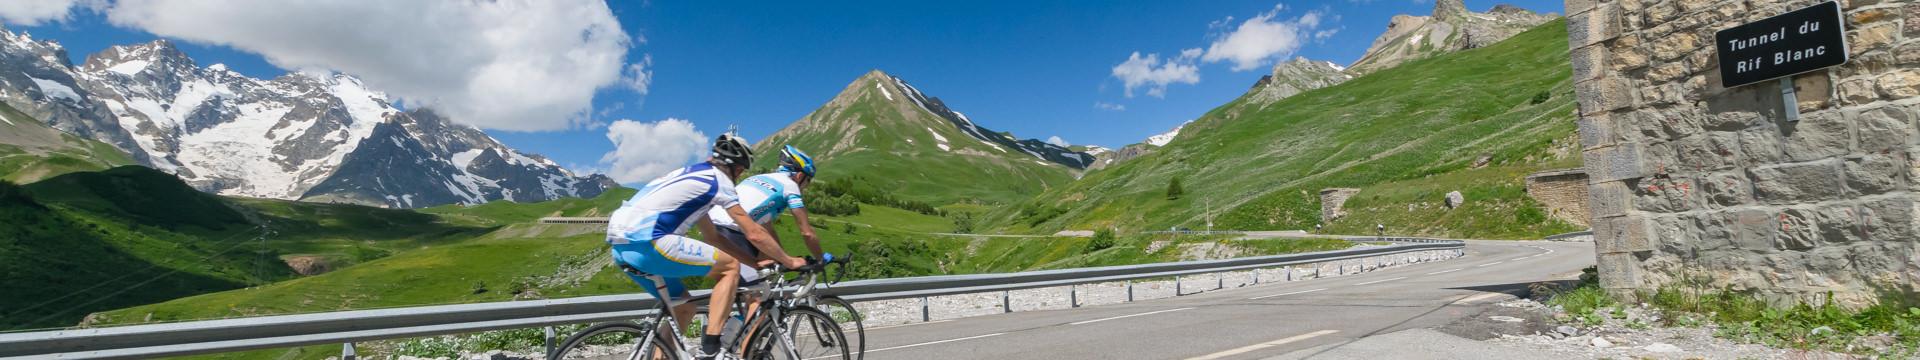 Les itinéraires cyclo et VTT